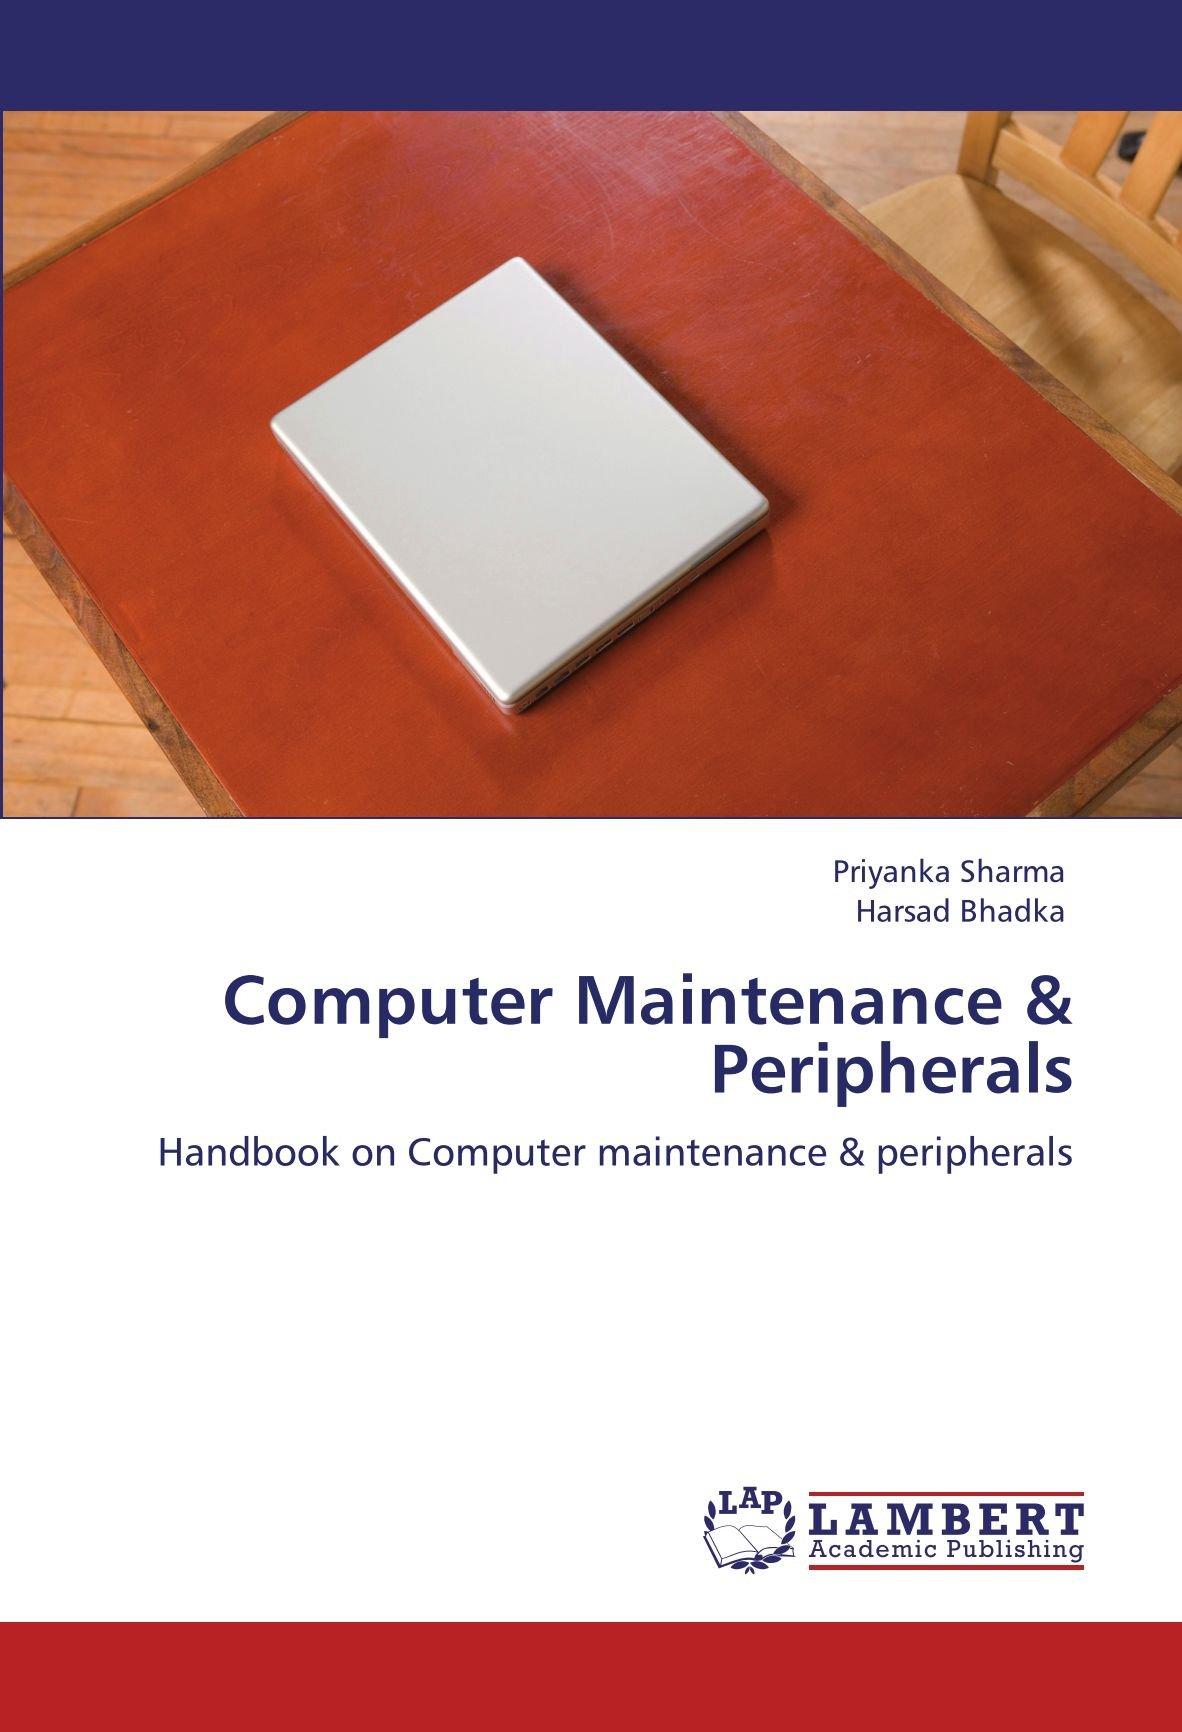 Computer Maintenance & Peripherals: Handbook on Computer maintenance & peripherals pdf